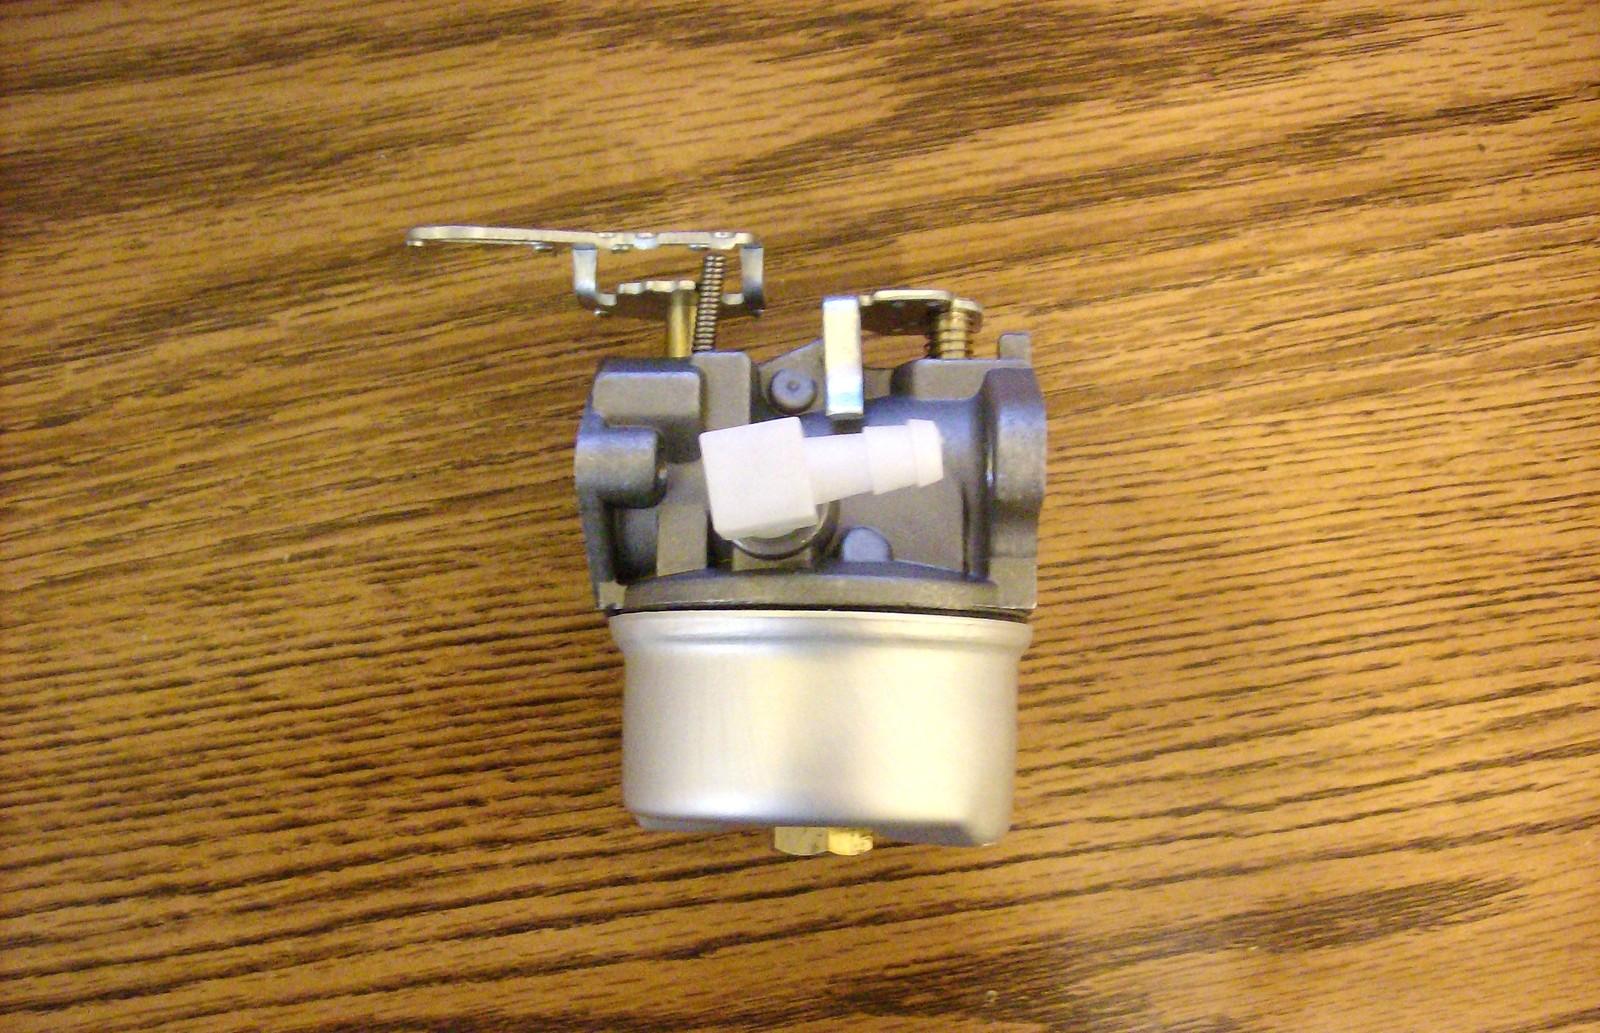 Tecumseh HSK40, HSK50, HSSK50, HS50 carburetor 640084, 640084B, 632107, 632107A